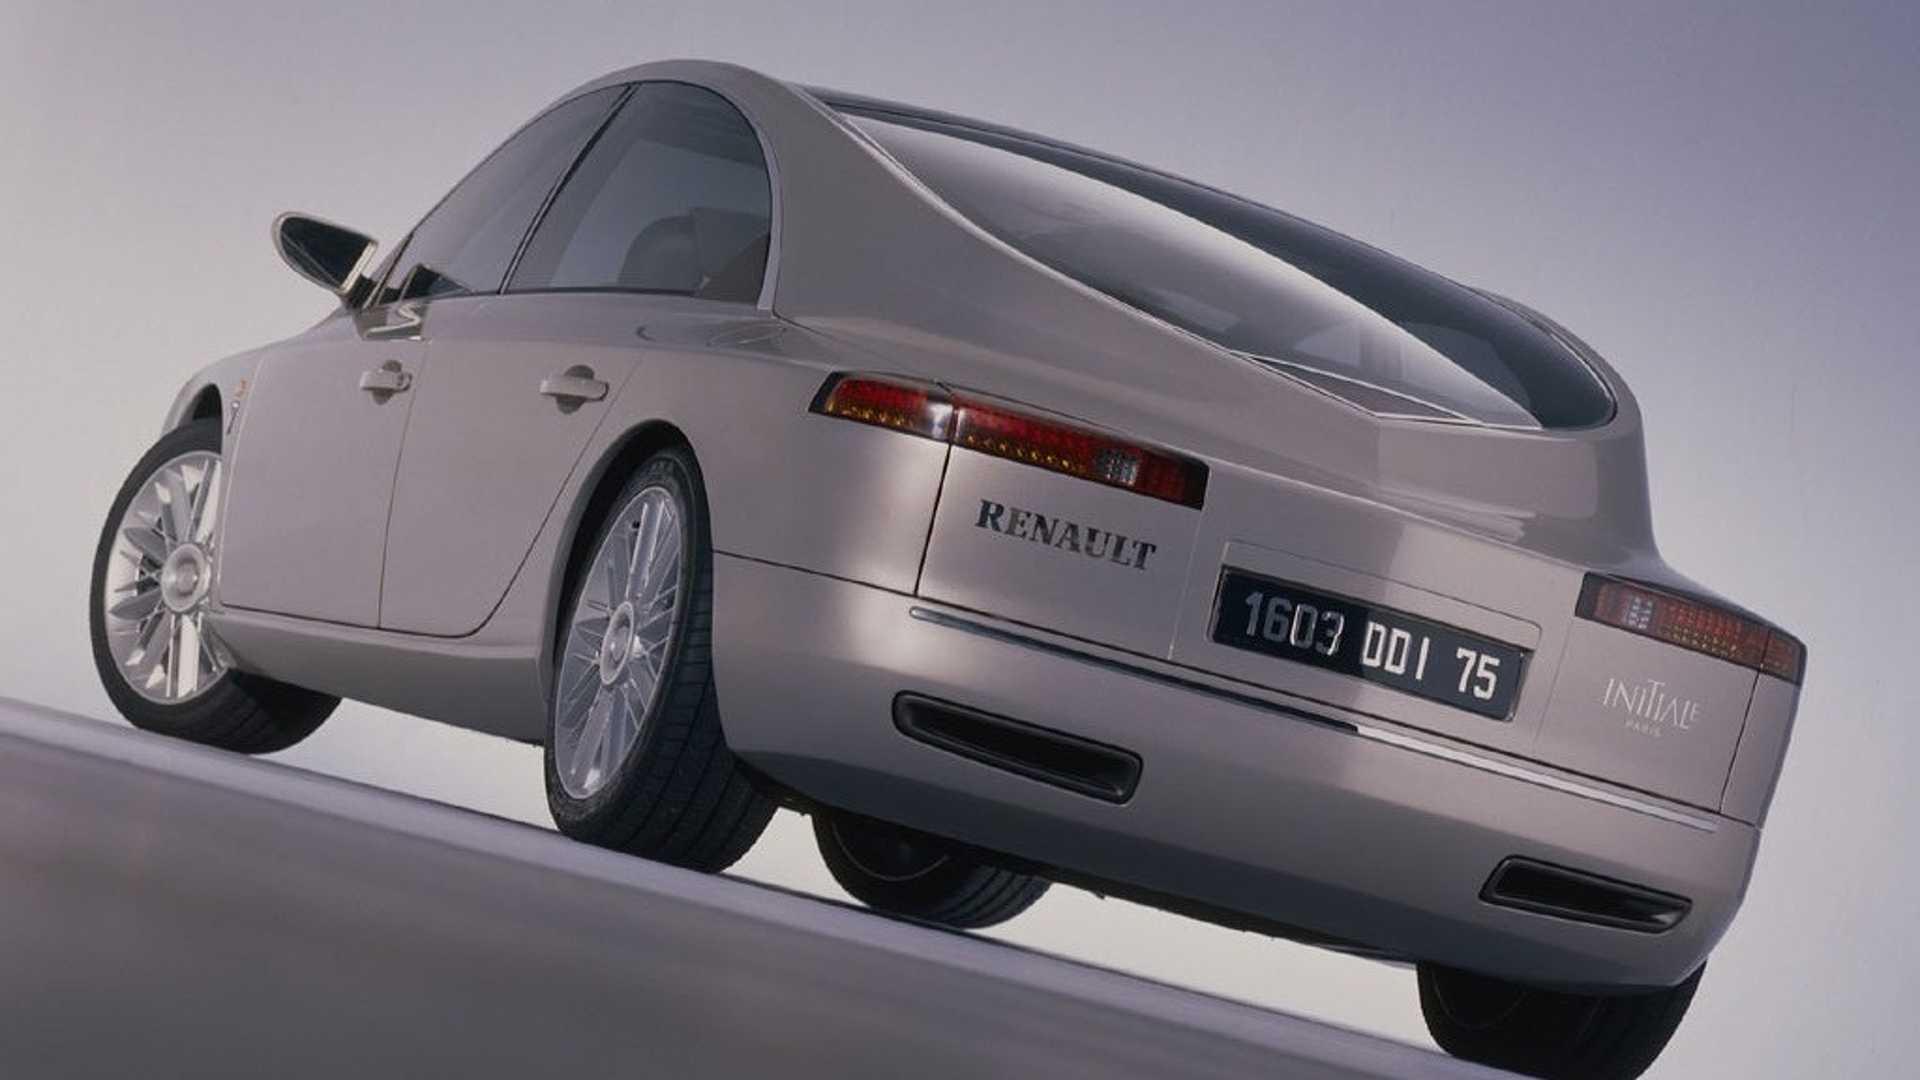 1995-renault-initiale-concept10